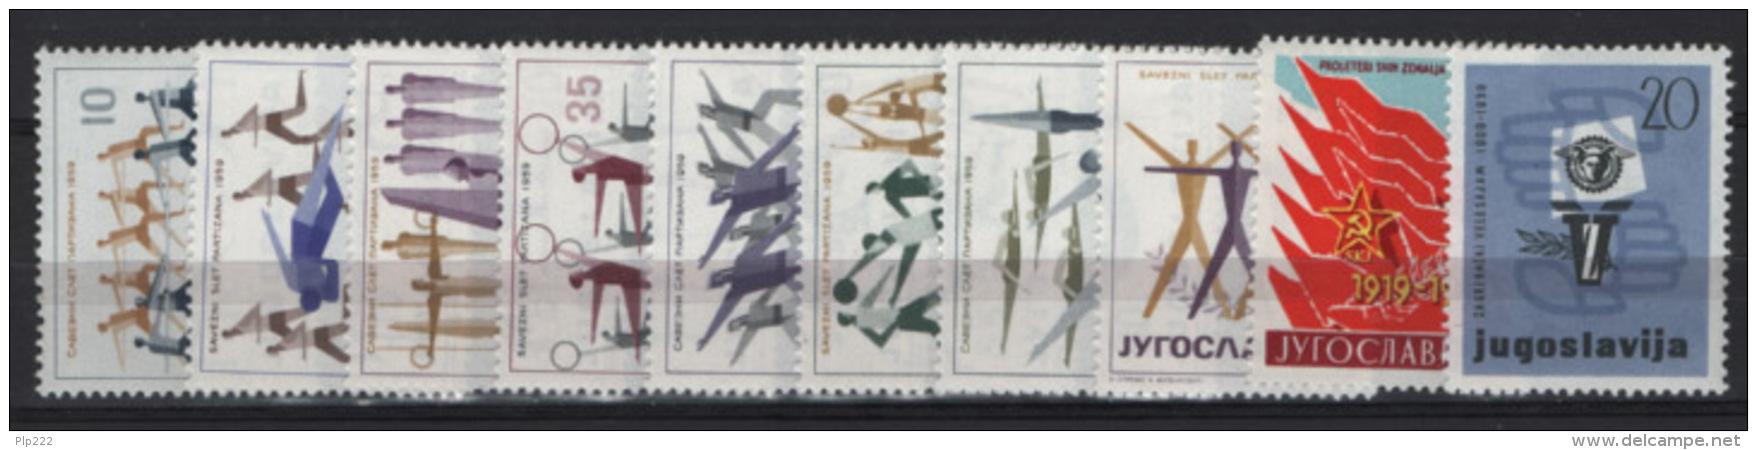 Jugoslavia 1959 3 Emissioni/Issues **/MNH VF - 1945-1992 Repubblica Socialista Federale Di Jugoslavia